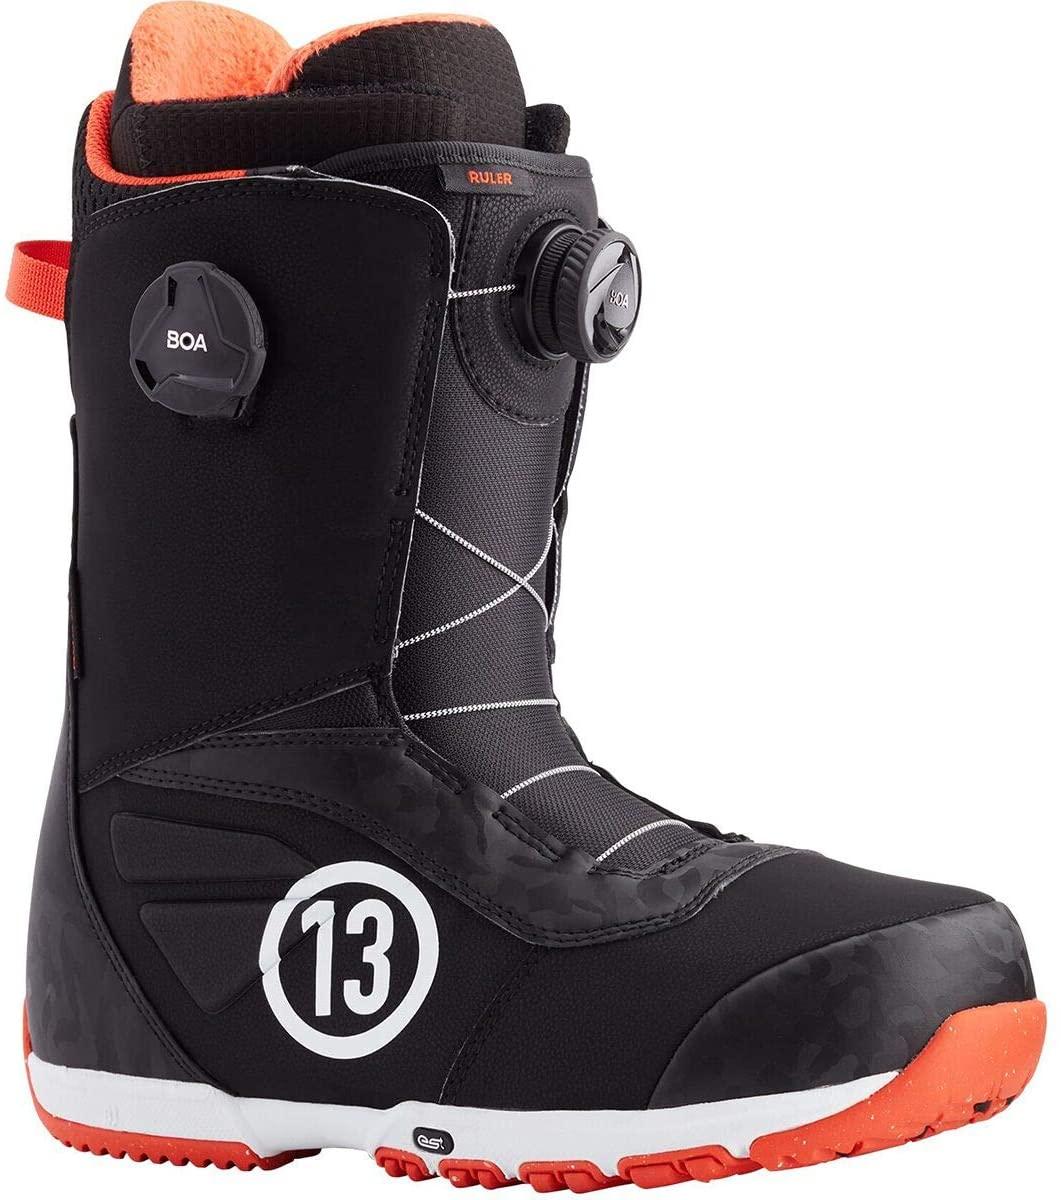 Burton Ruler Boa Snowboard Boot - Men's Black/Red, 9.5